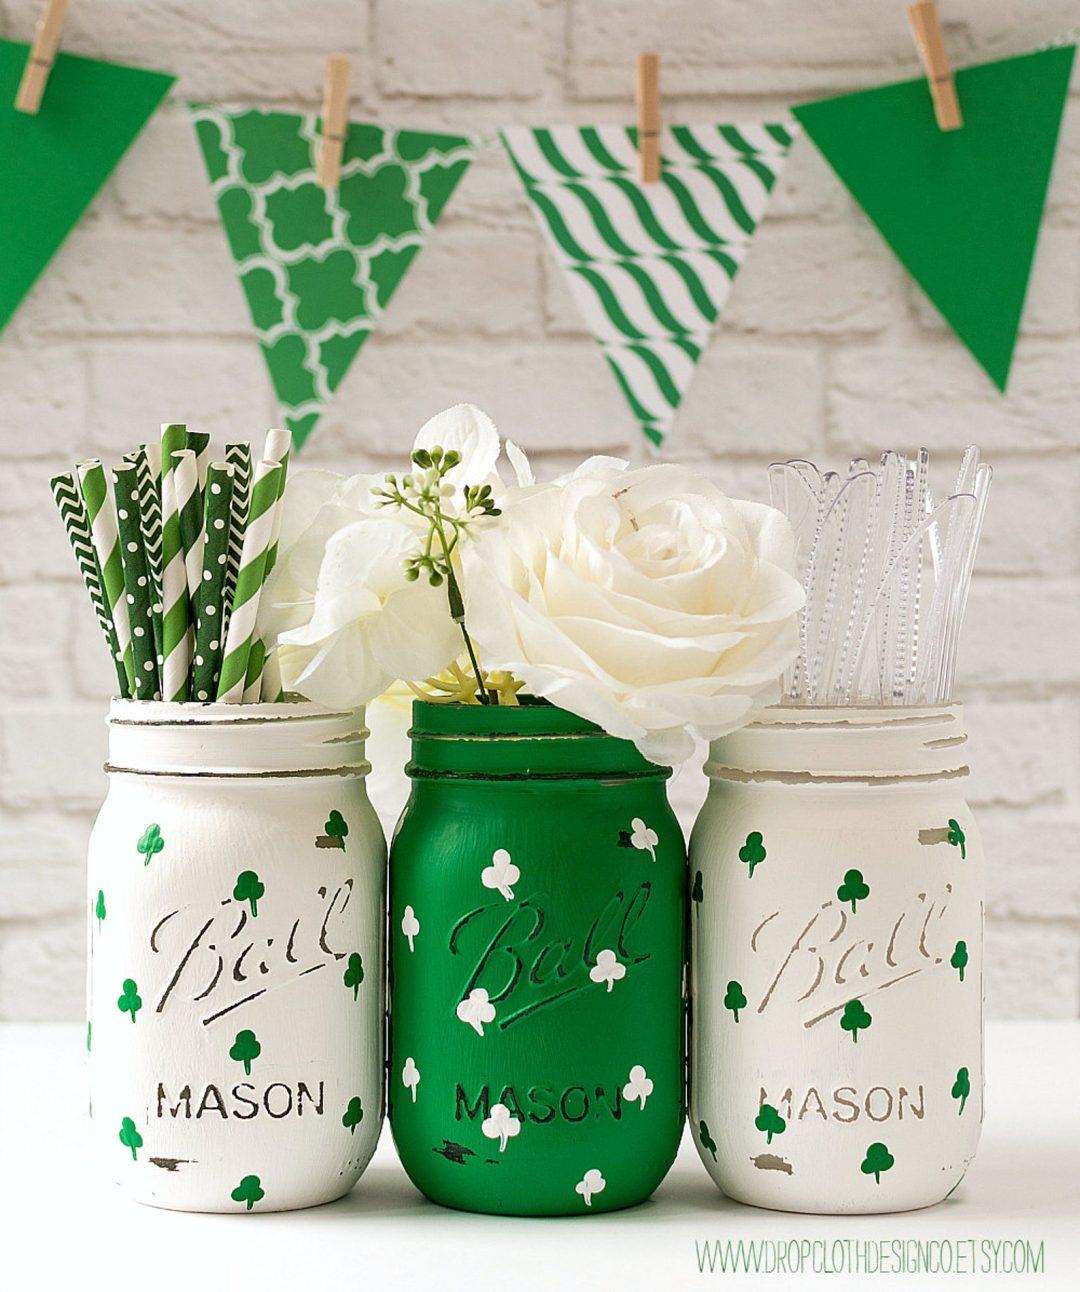 St. Patrick's Day decor ideas - St. Patrick's Day mason jars